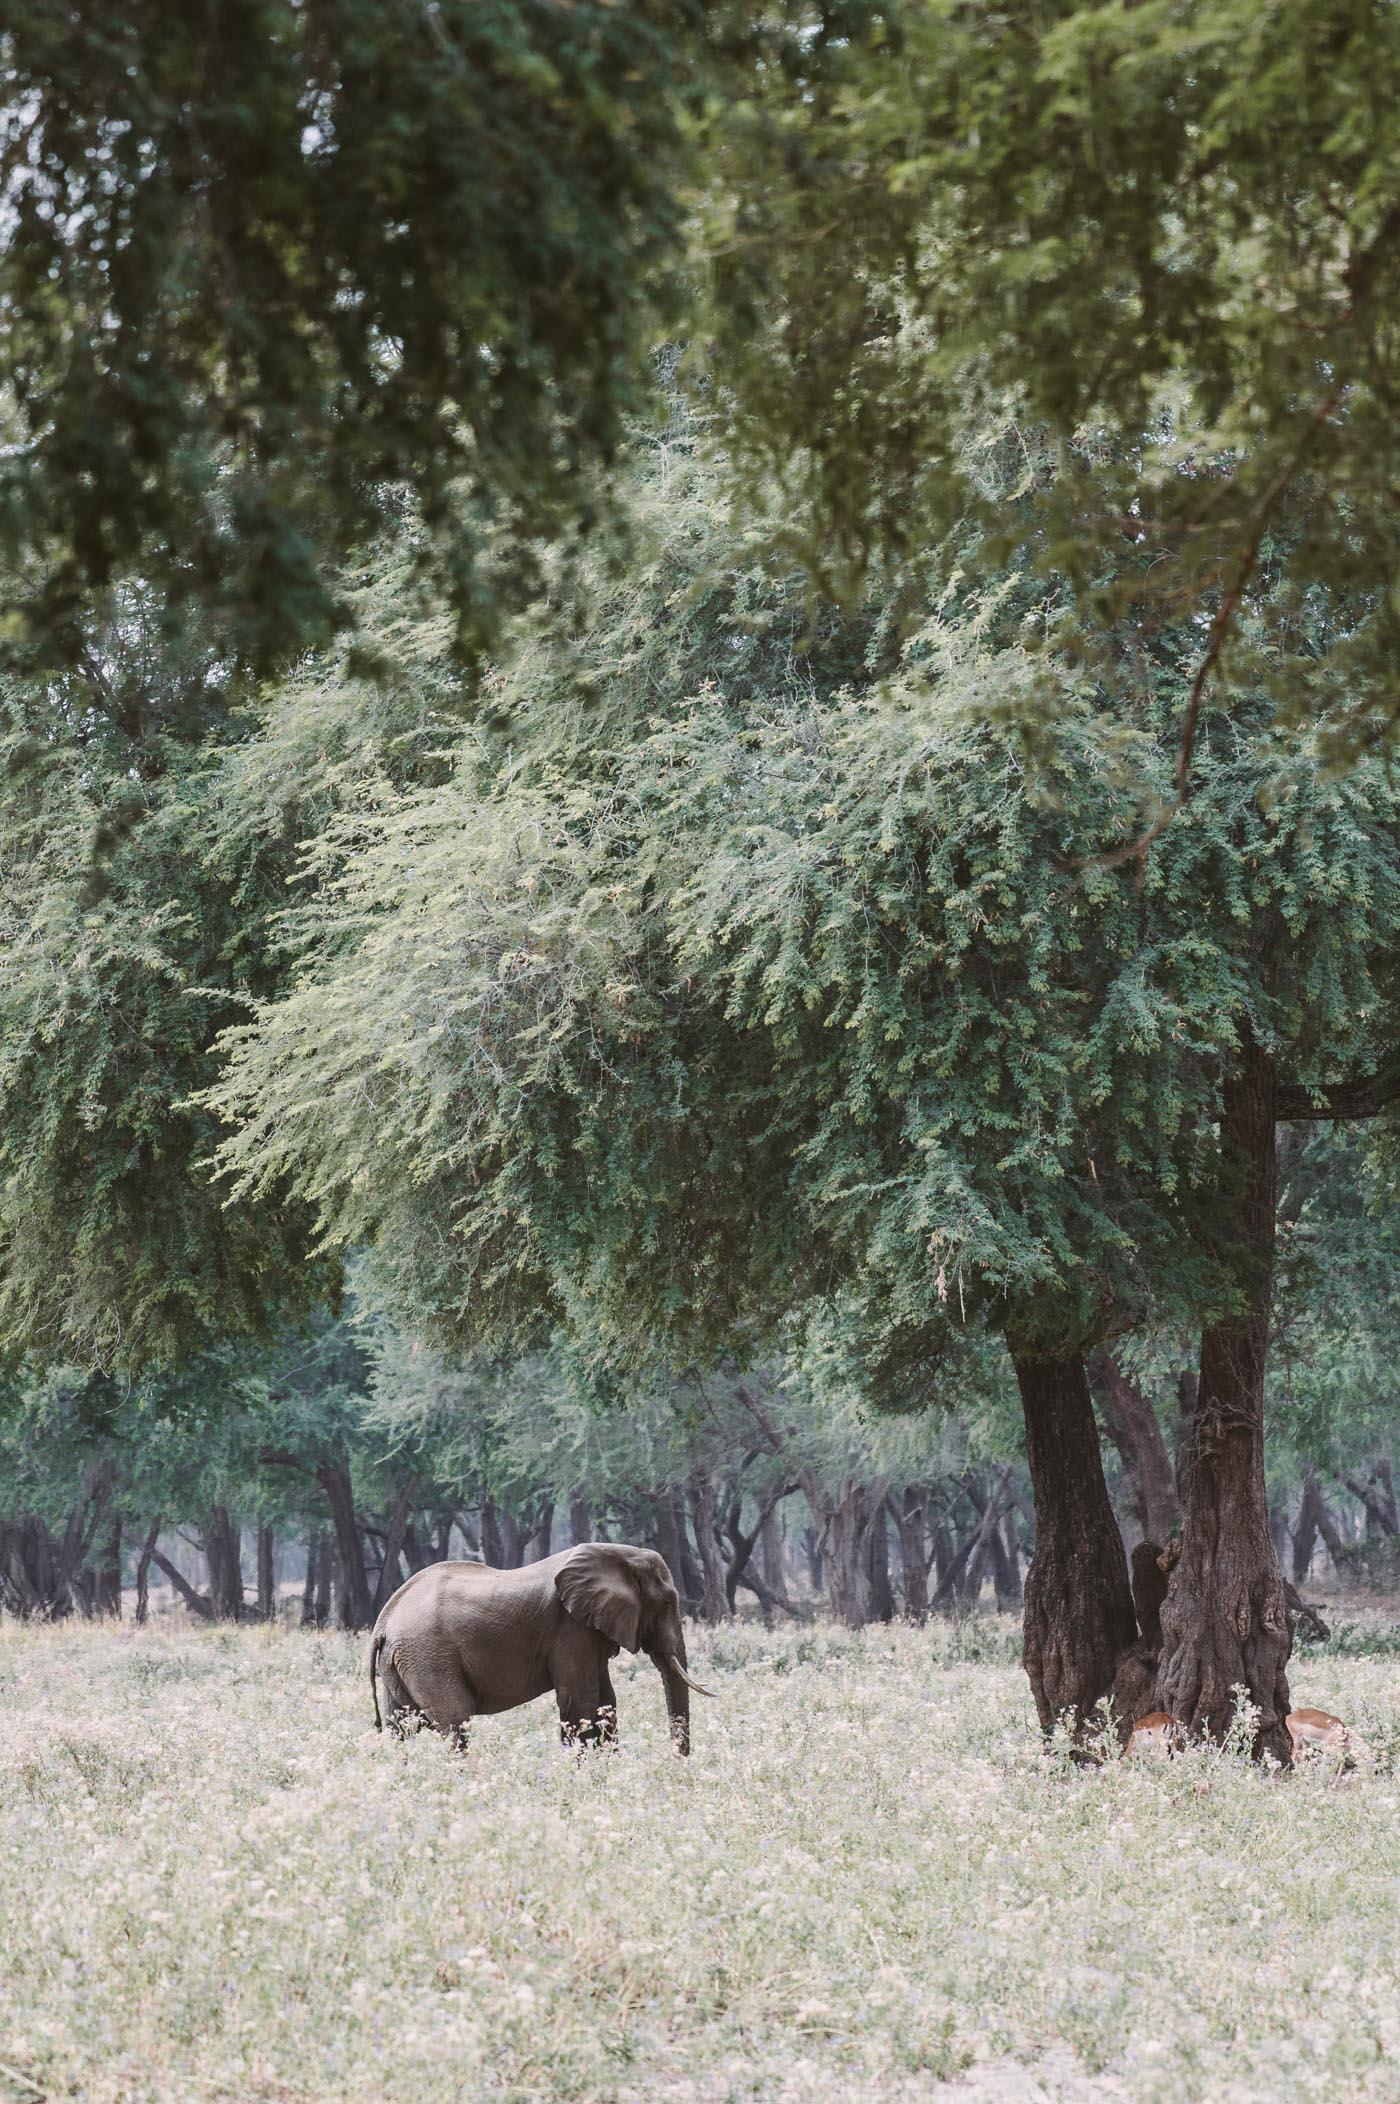 Elephant in the Lower Zambezi National Park Zambia